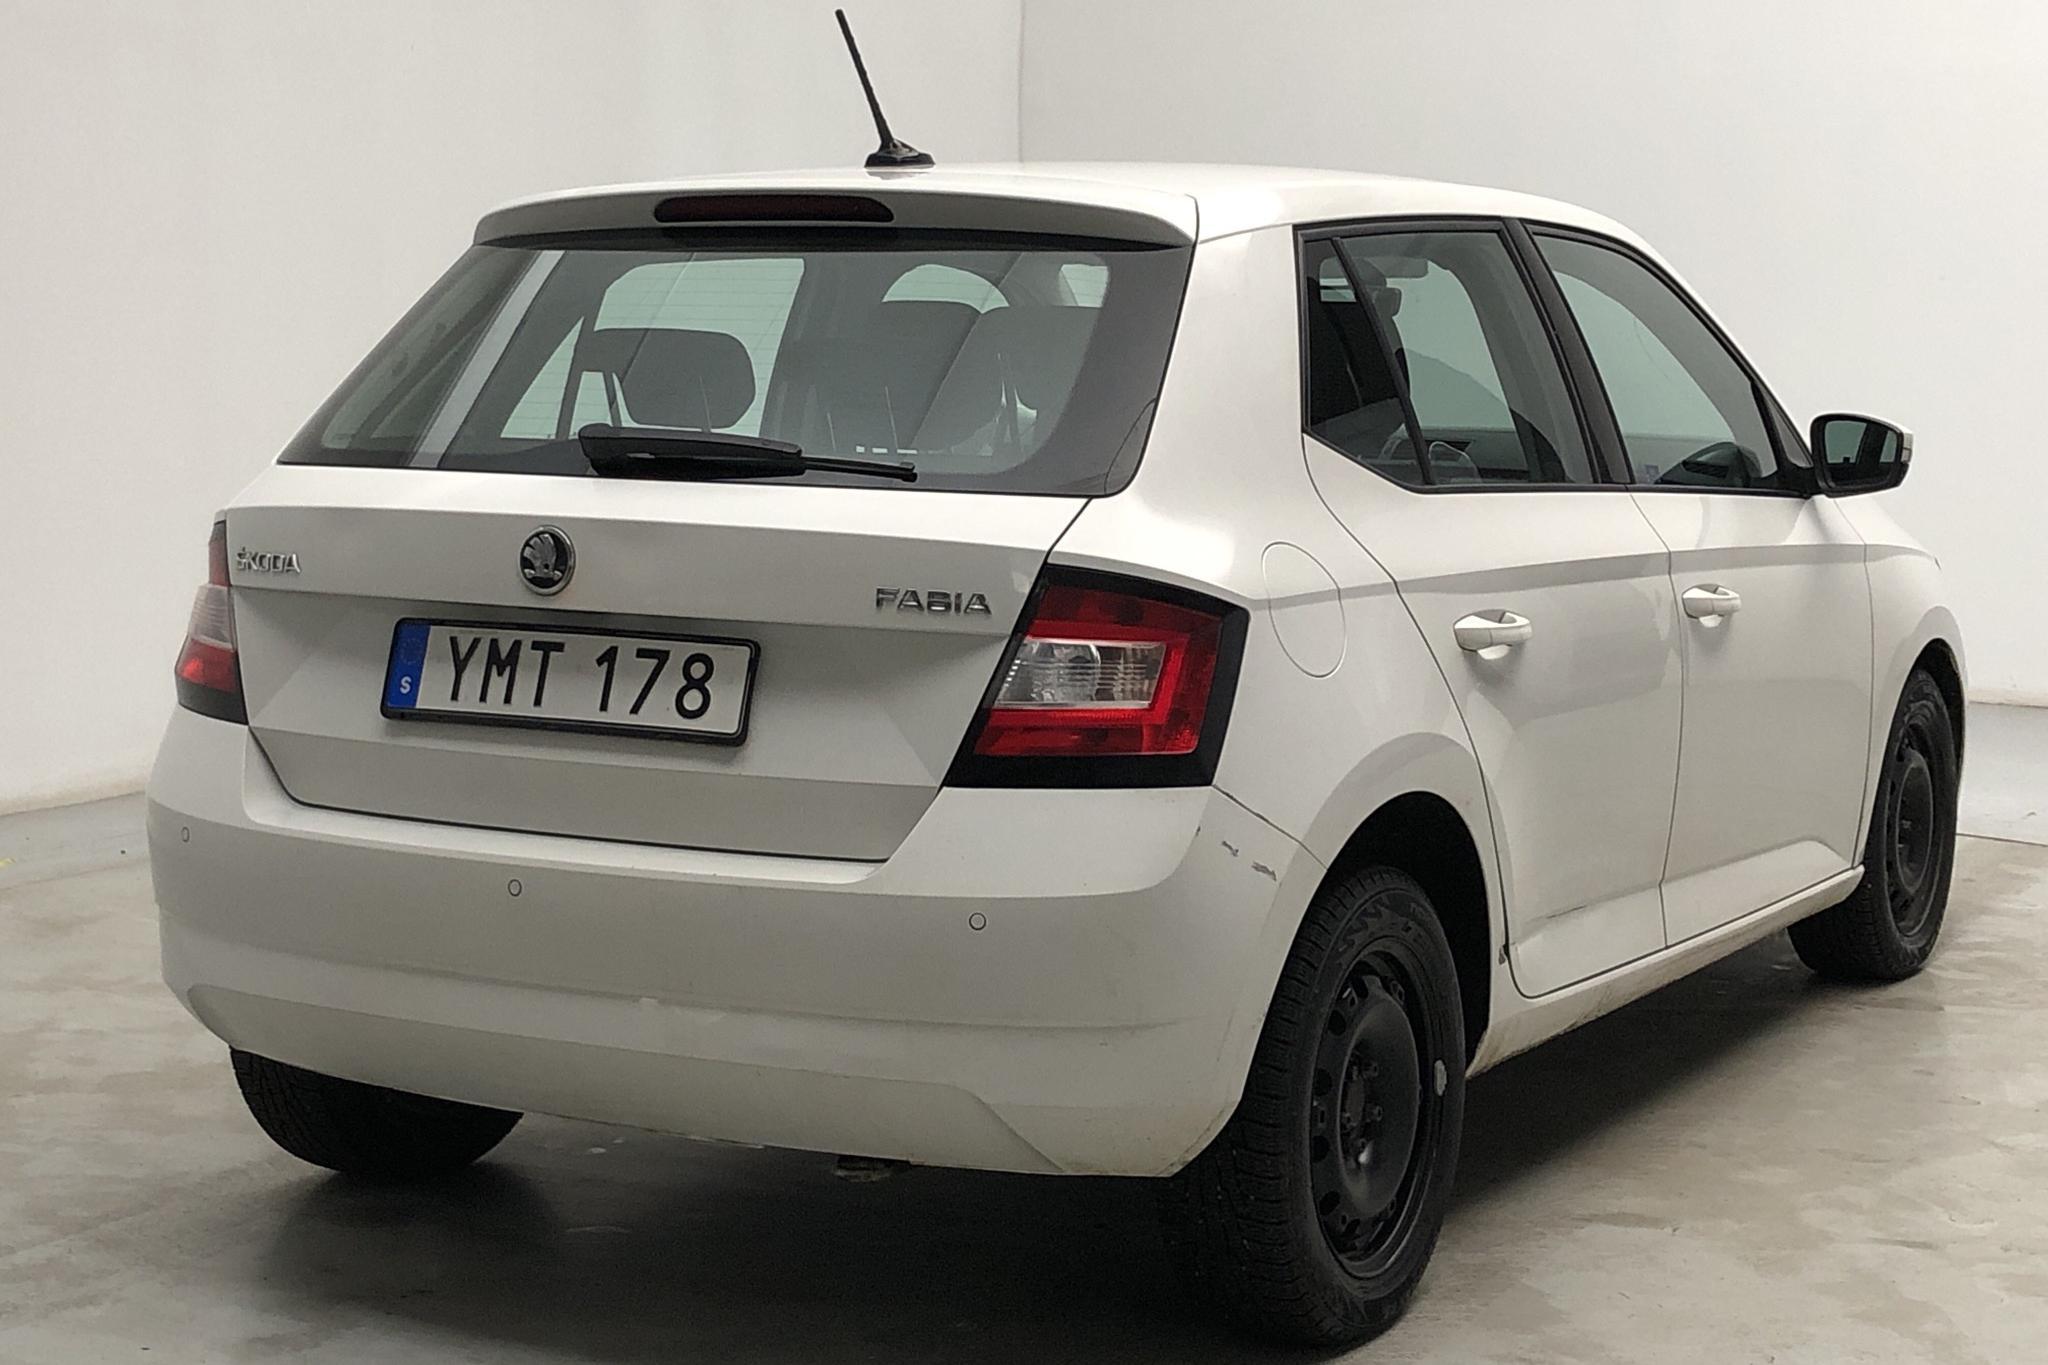 Skoda Fabia 1.0 TSI (110hk) - 222 860 km - Automatic - white - 2018